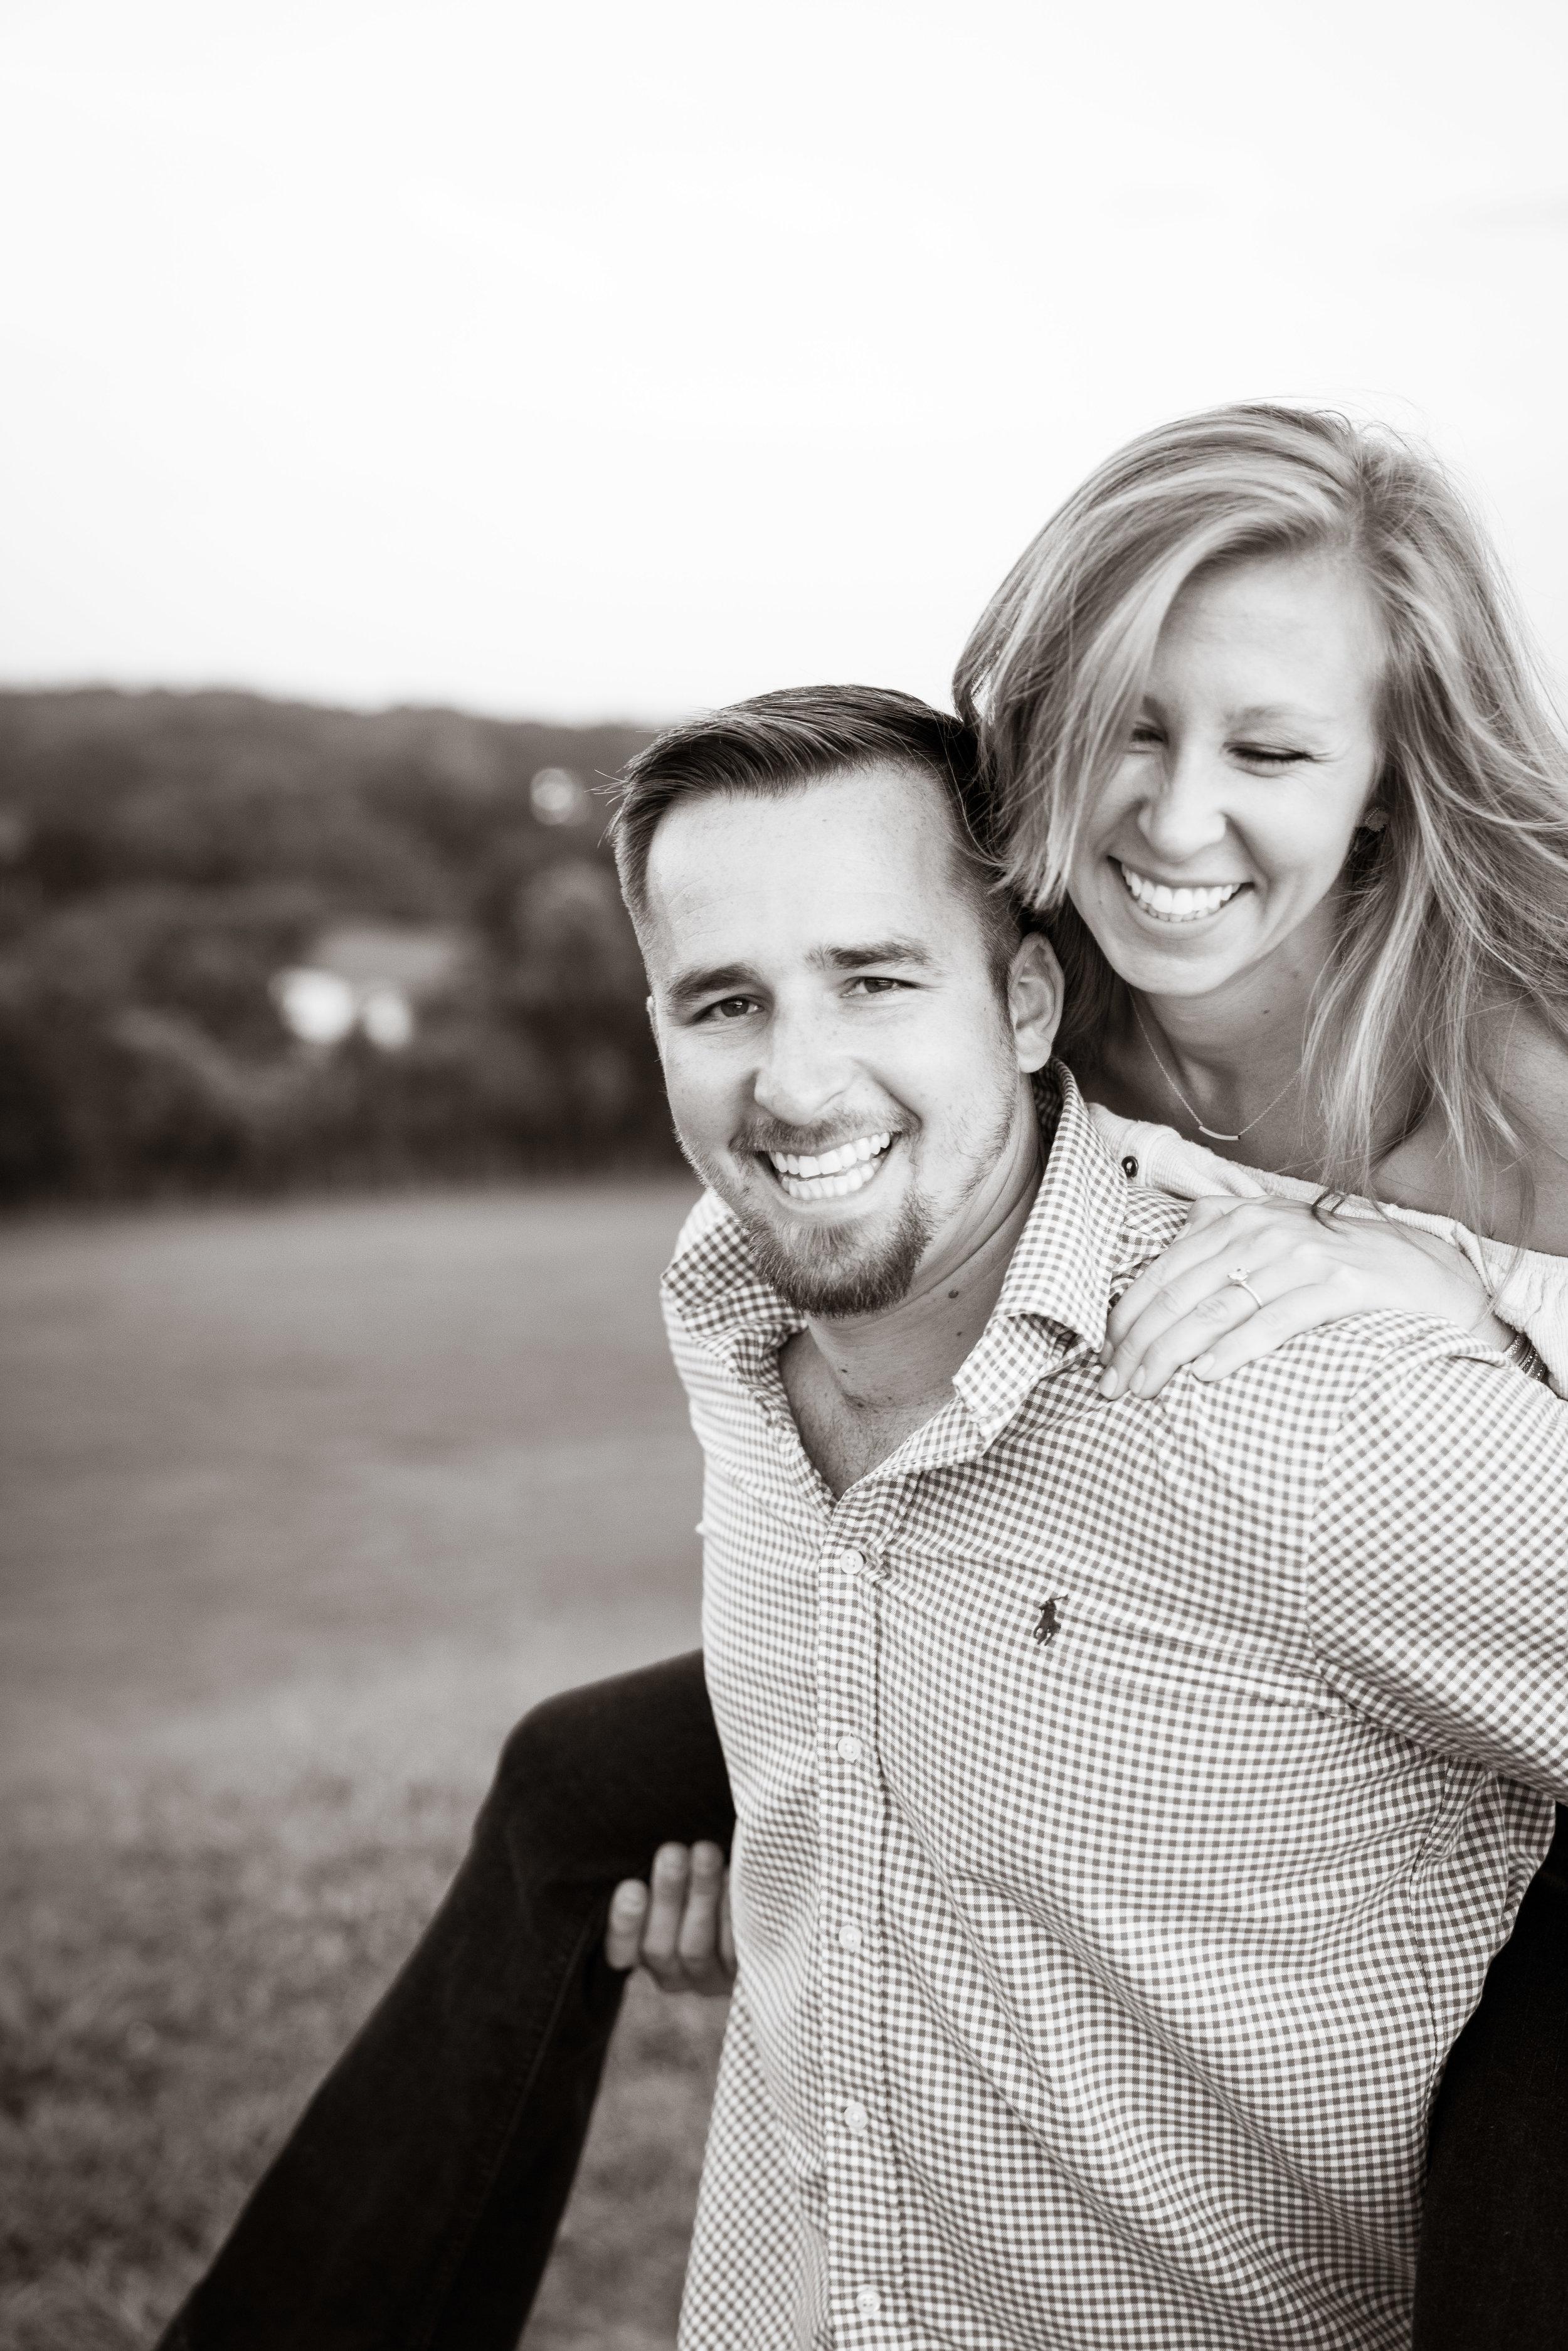 Having fun | Engagement Session in Clemson SC